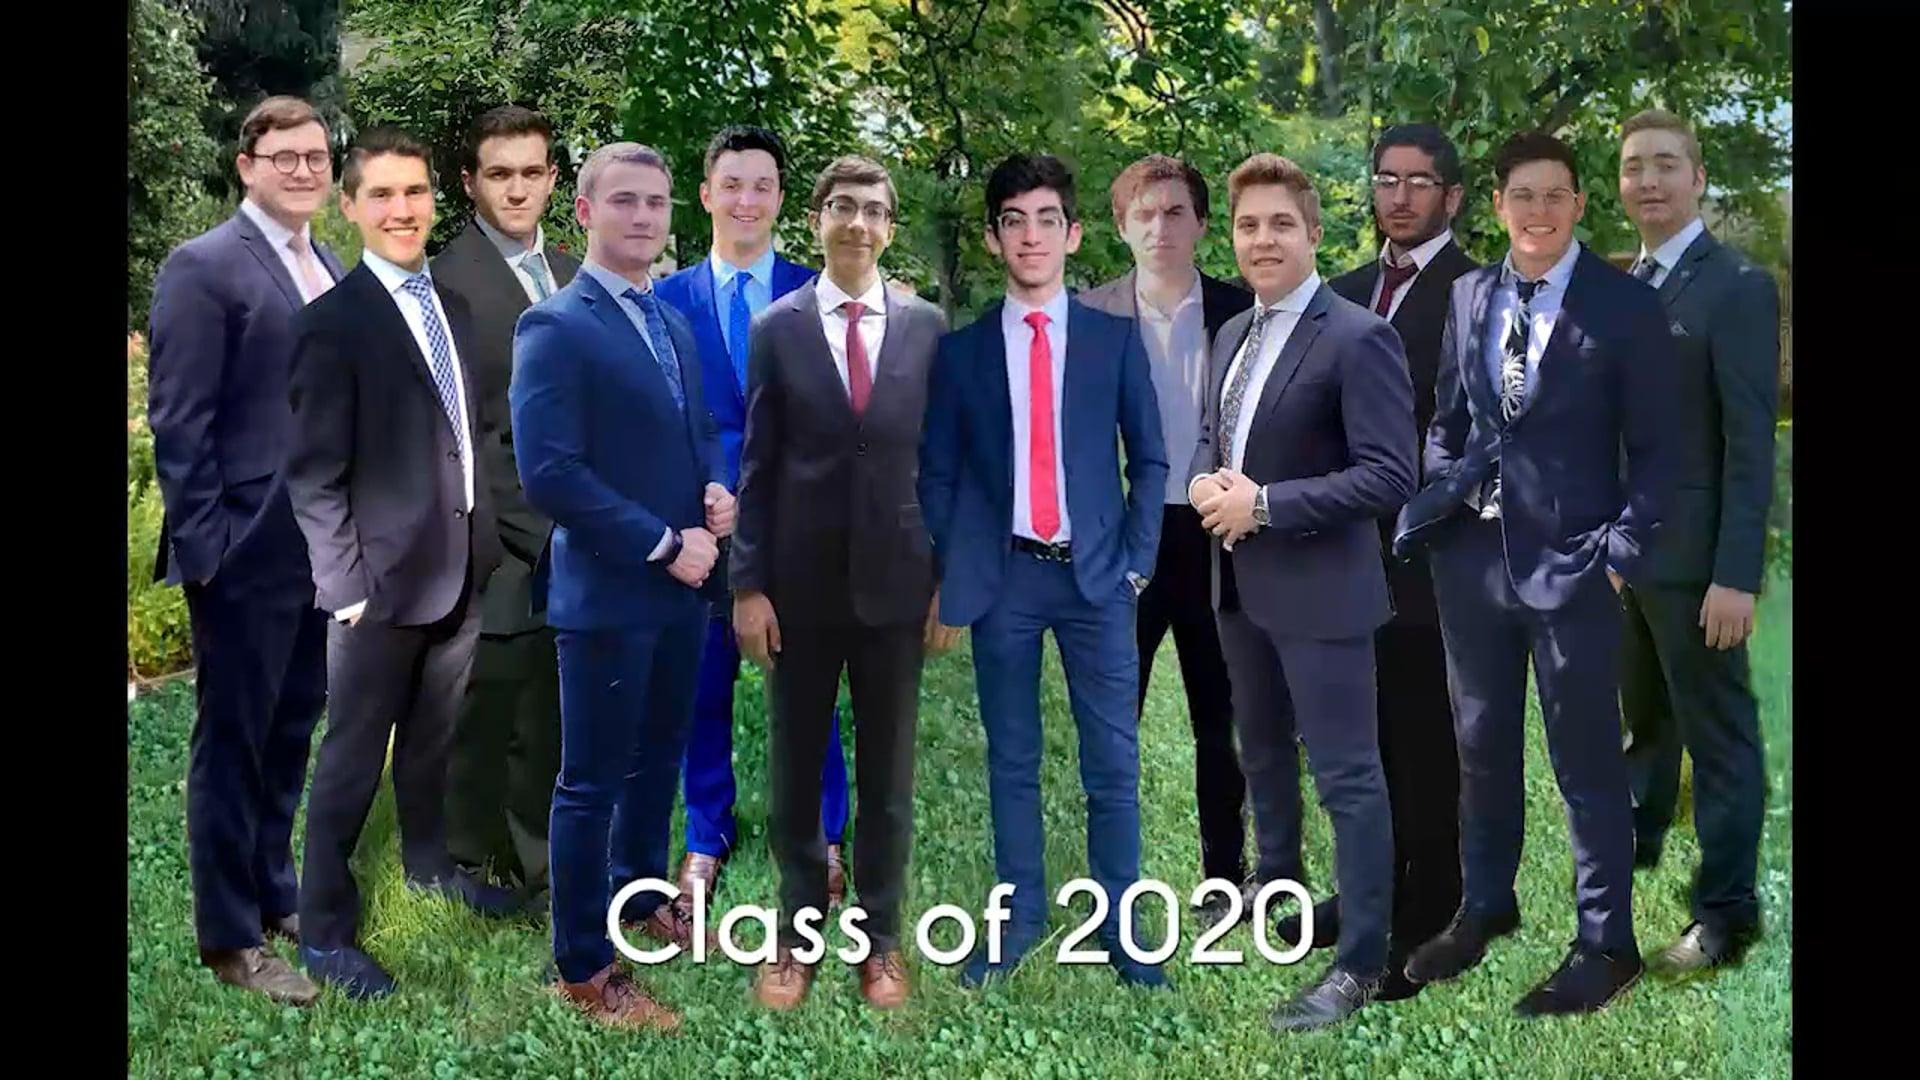 Class of 2020 Graduation Program